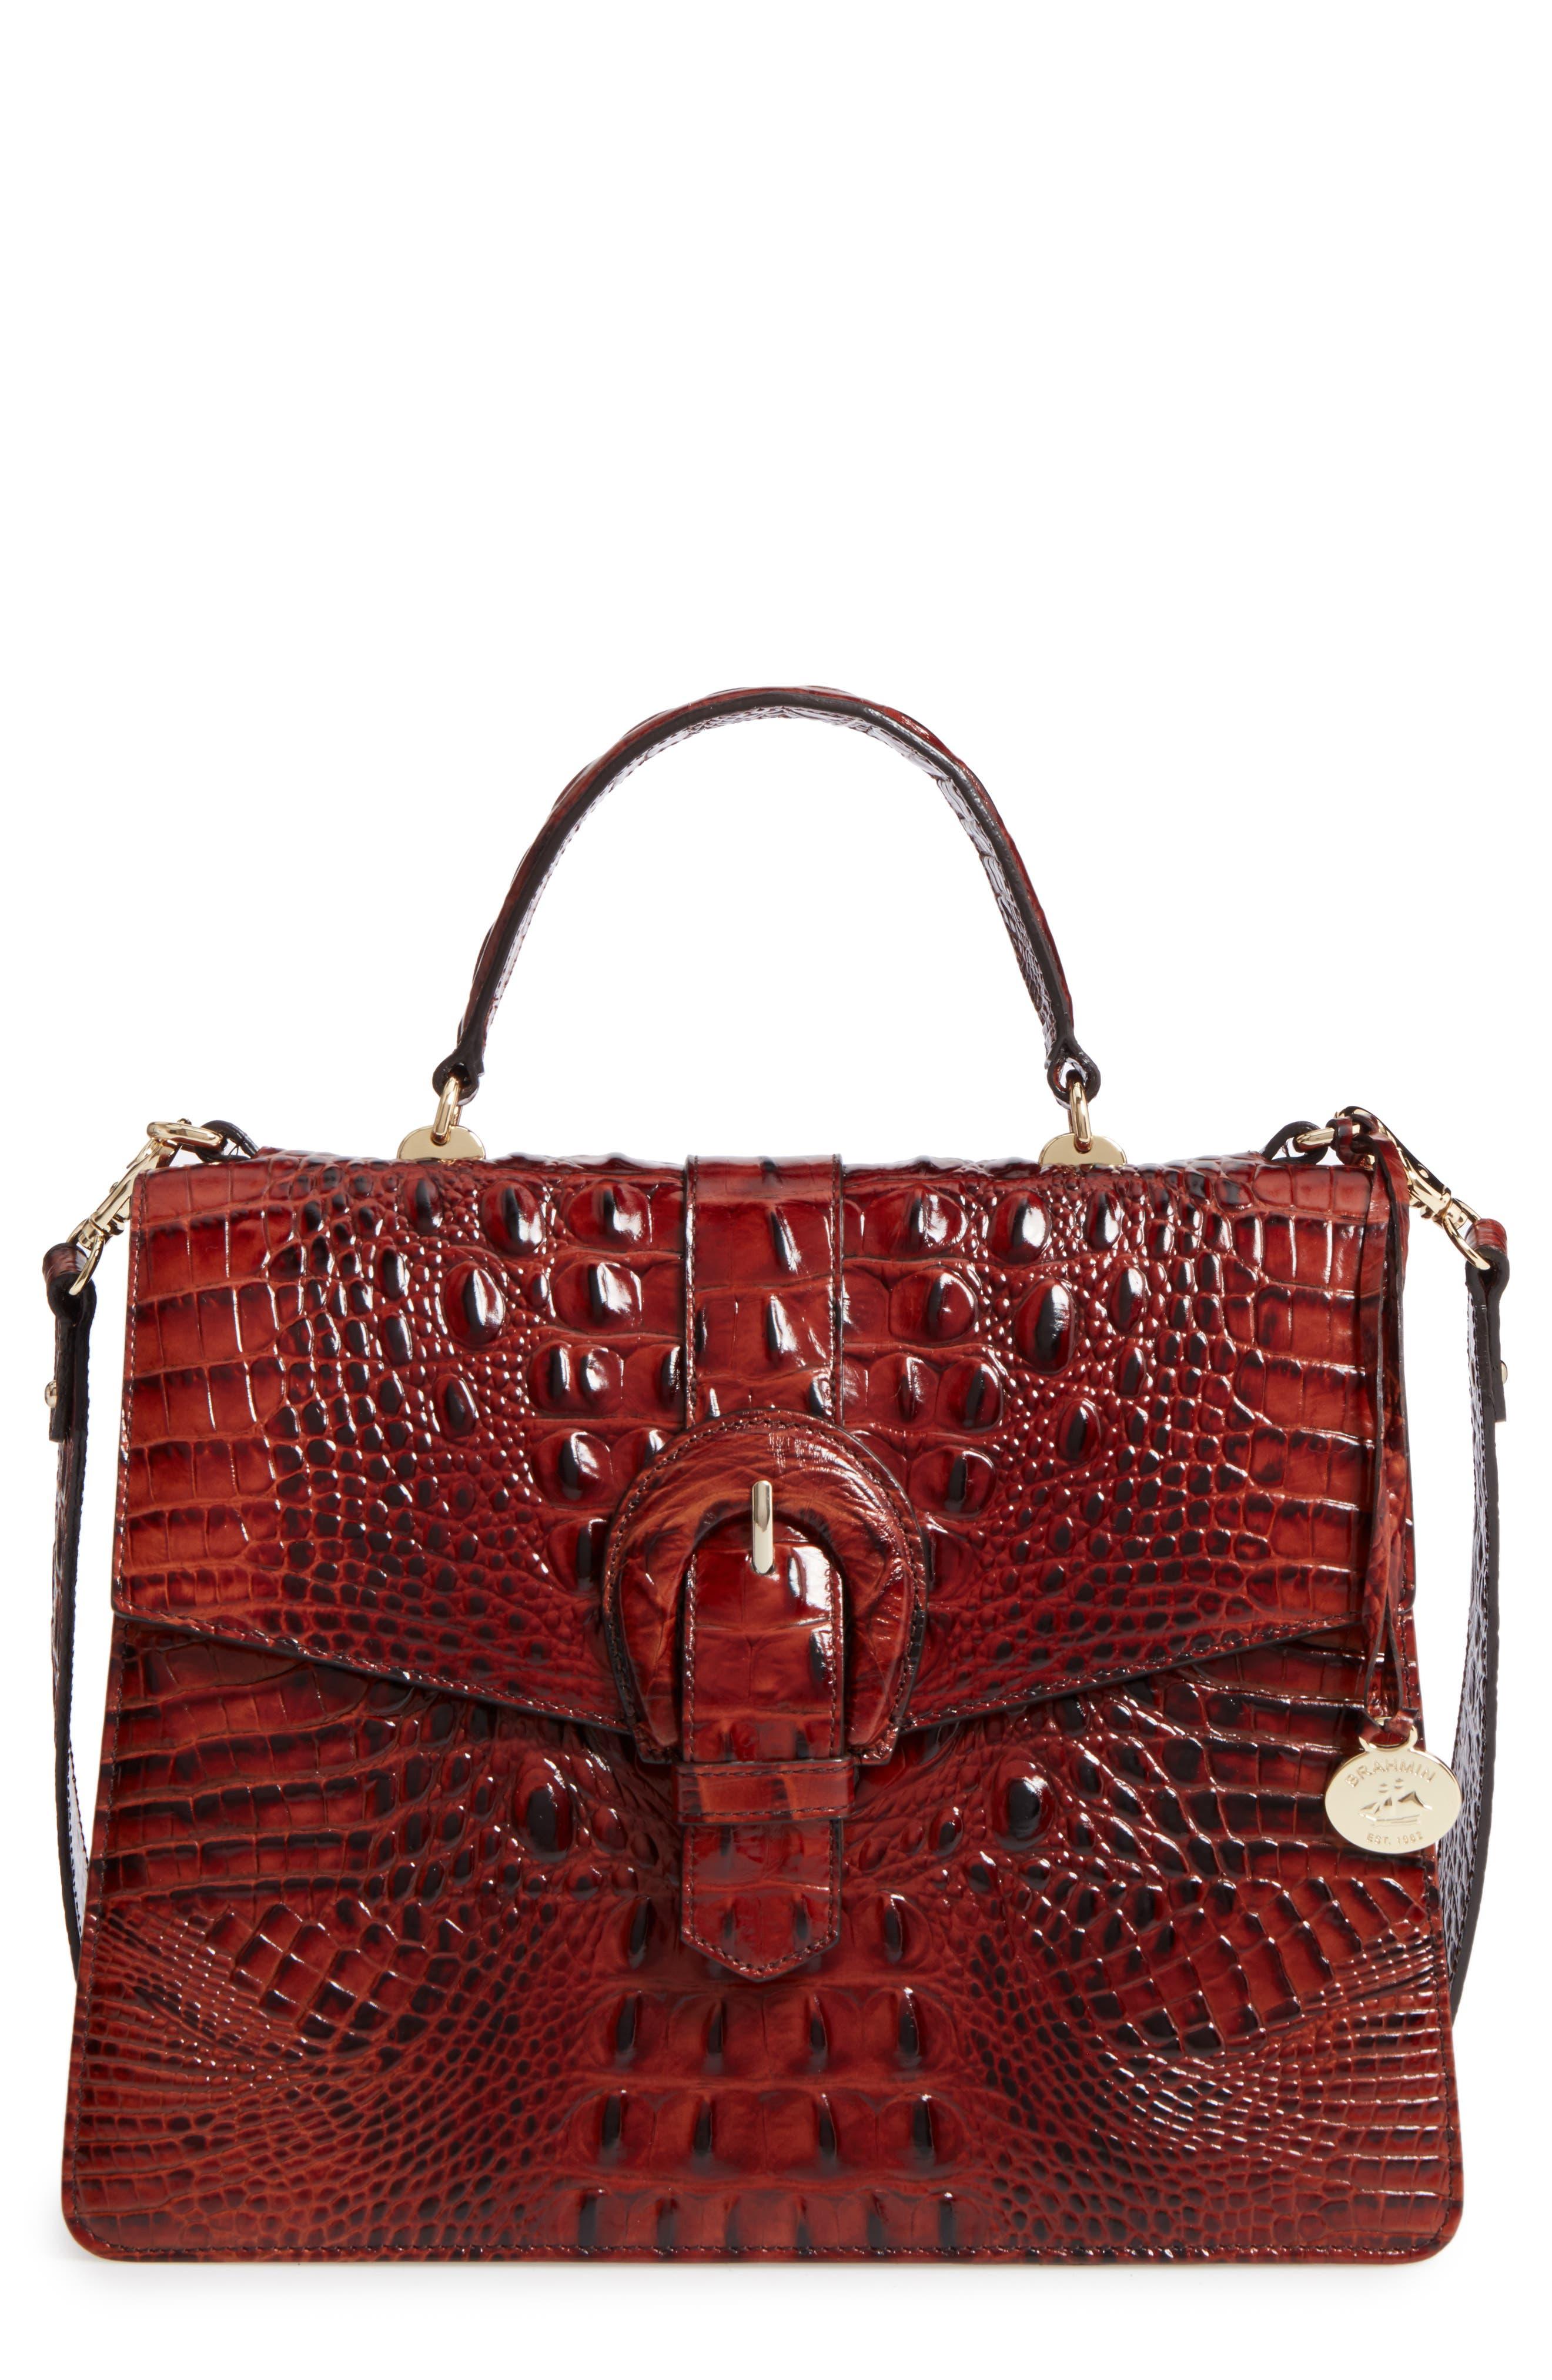 Brahmin Melbourne Gabriella Embossed Leather Satchel